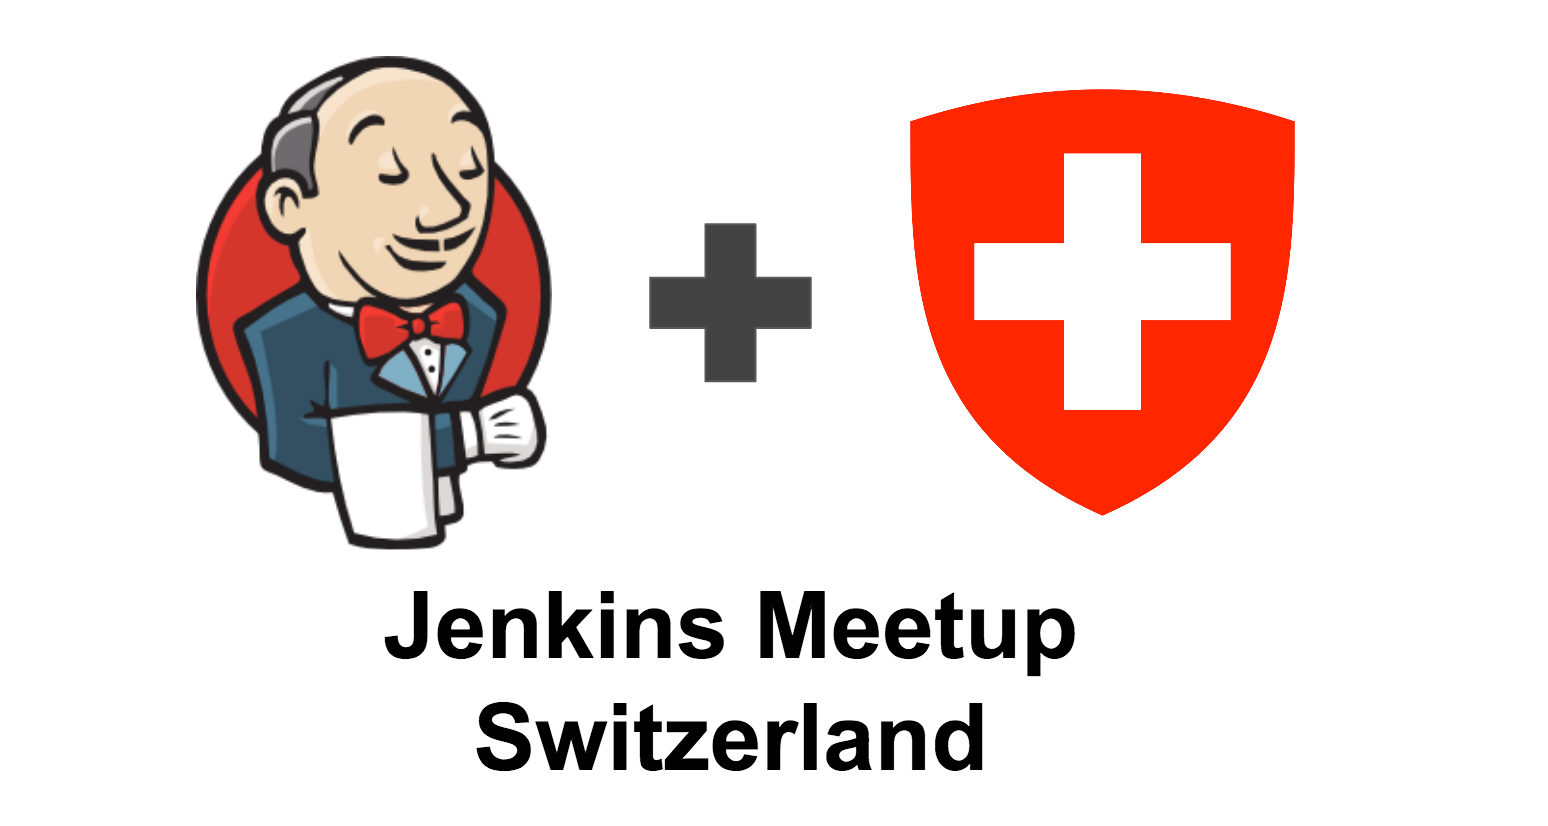 Jenkins Meetup Switzerland